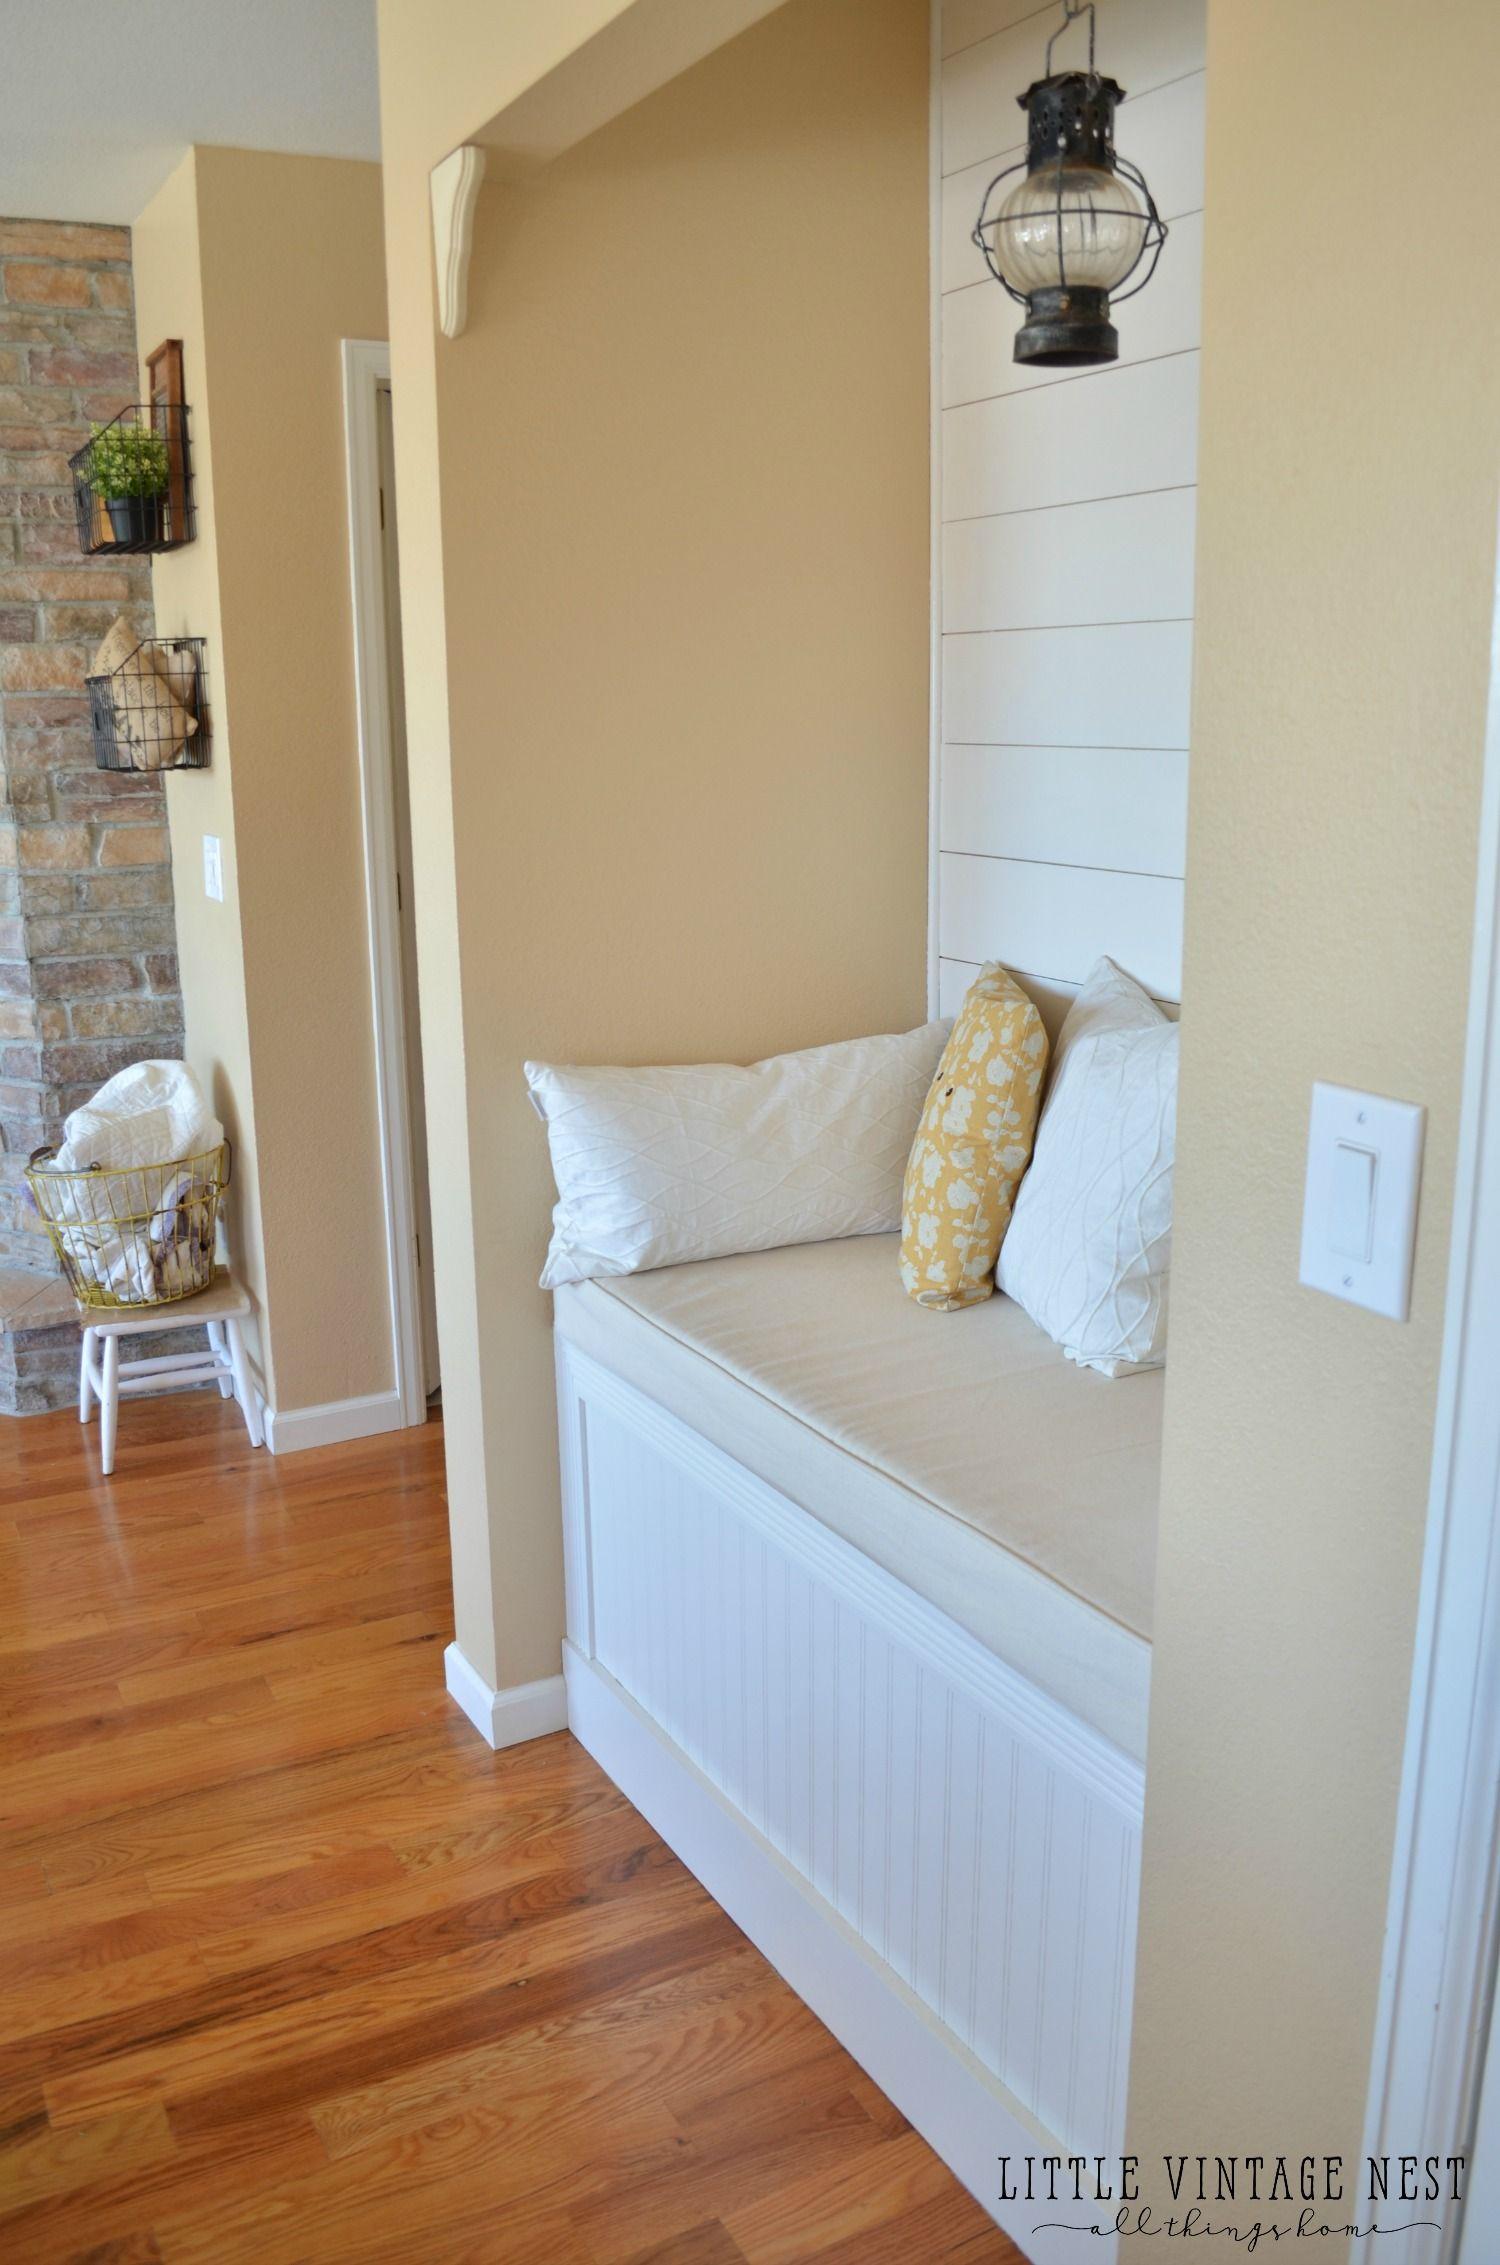 Blonde Paint Color : blonde, paint, color, Reading, Planked, Walls, Paint, Kitchen, Walls,, Nook,, Plank